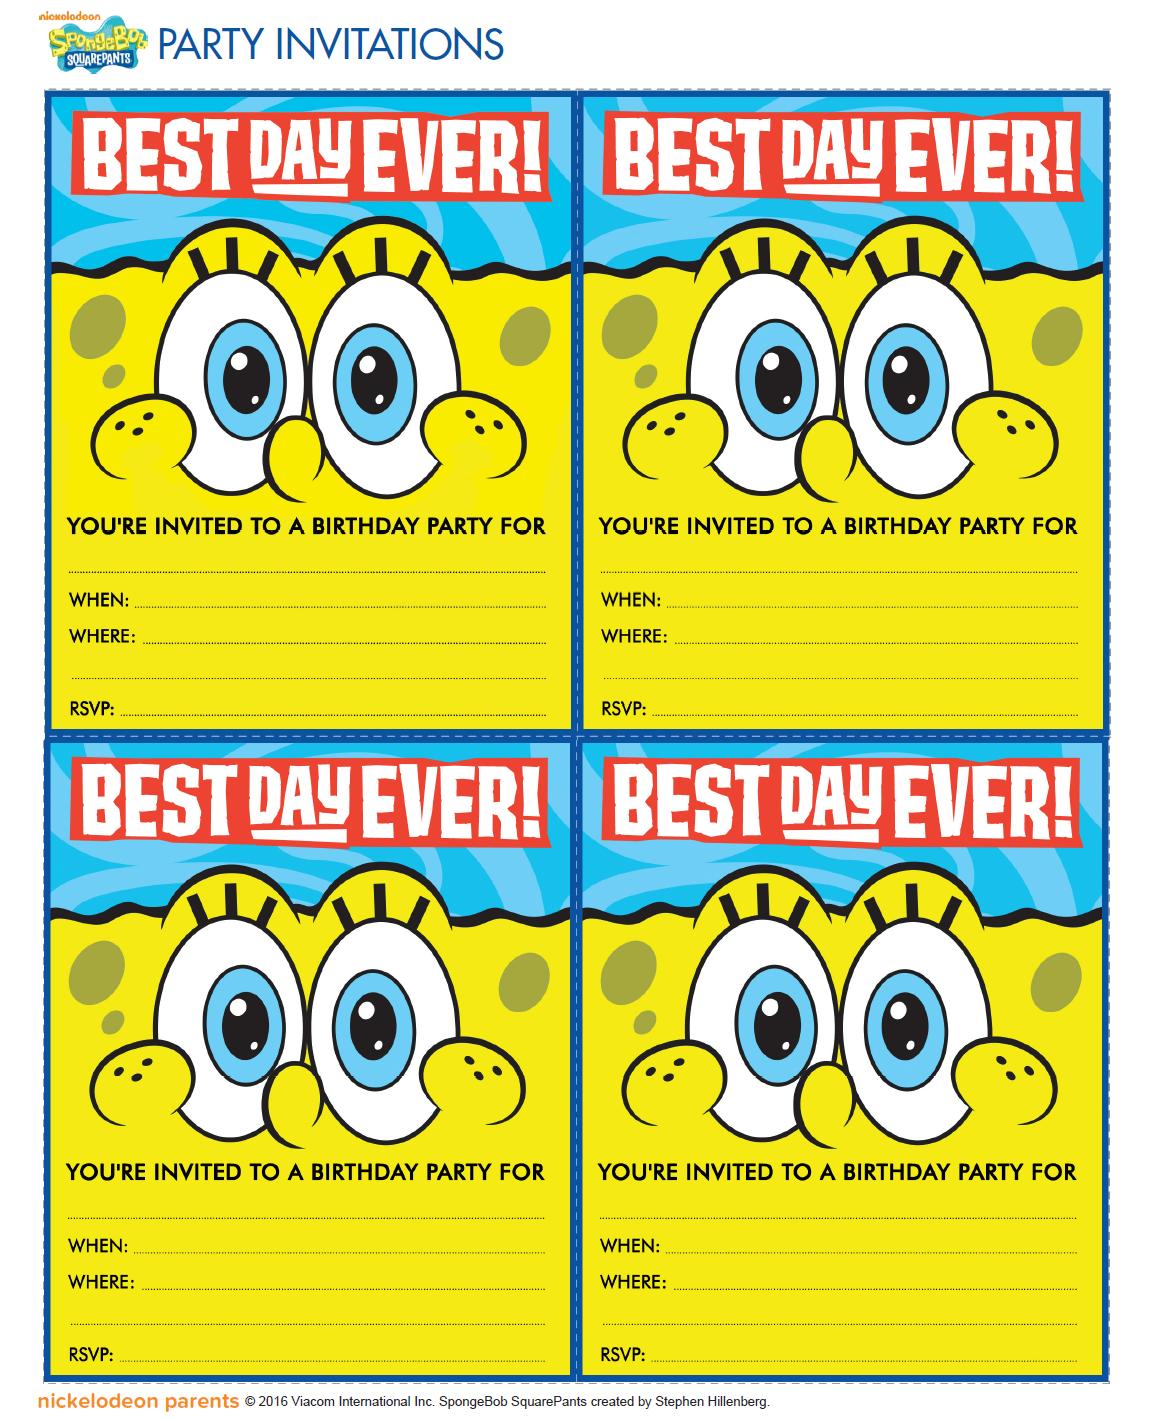 Http Www Nickelodeonparents Com Spongebob Best Day Ever Party Invitations Spongebob Birthday Spongebob Party Spongebob Birthday Party Decorations